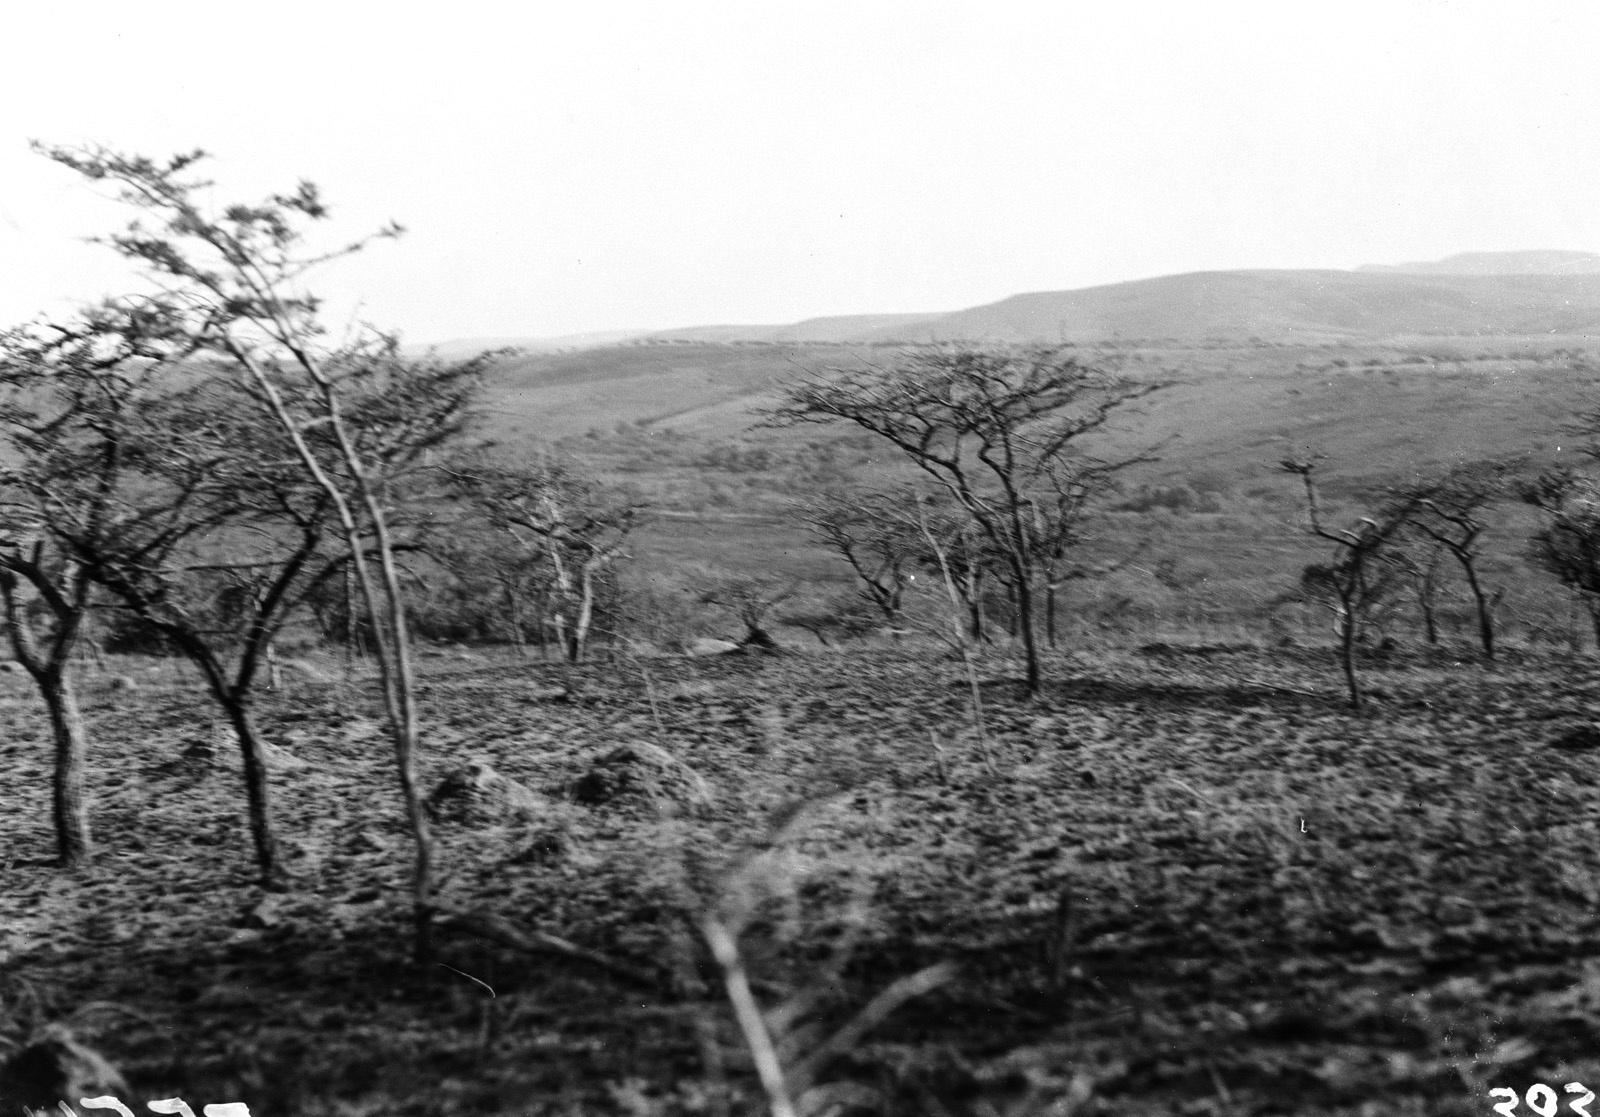 Квазулу-Наталь. Умфолози. Пейзаж в парке Умфолози.